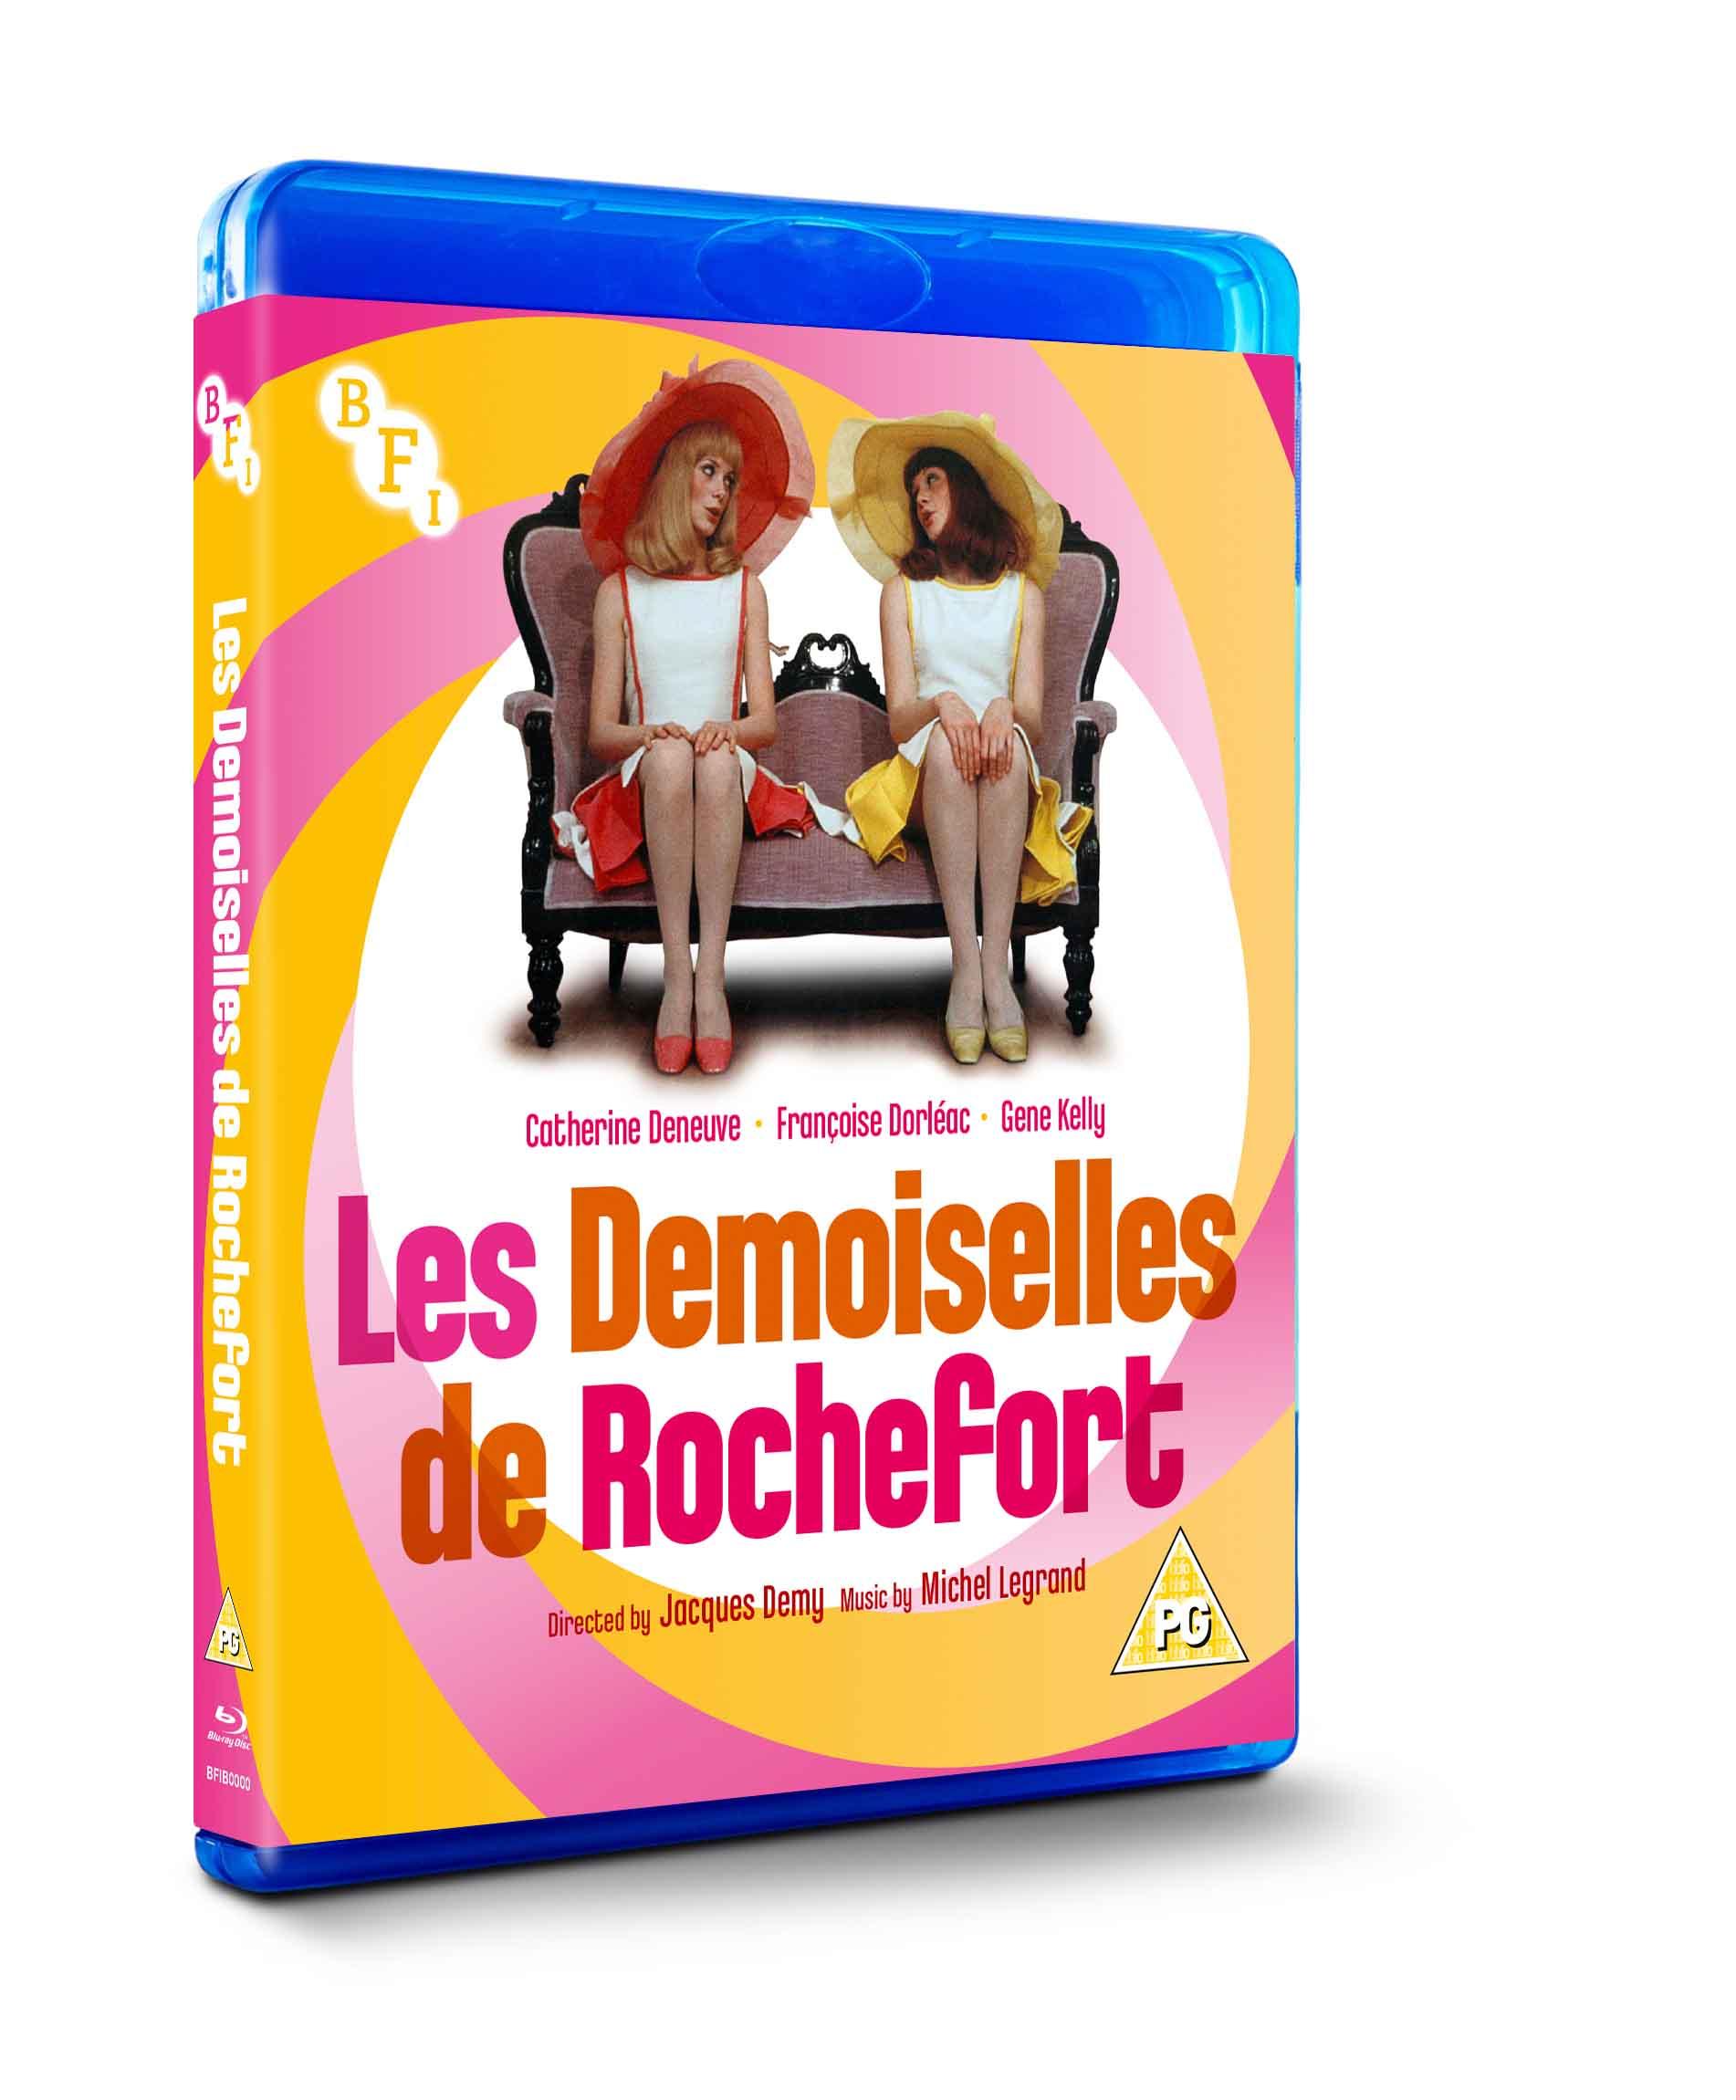 Buy Les Demoiselles de Rochefort (Blu-ray)